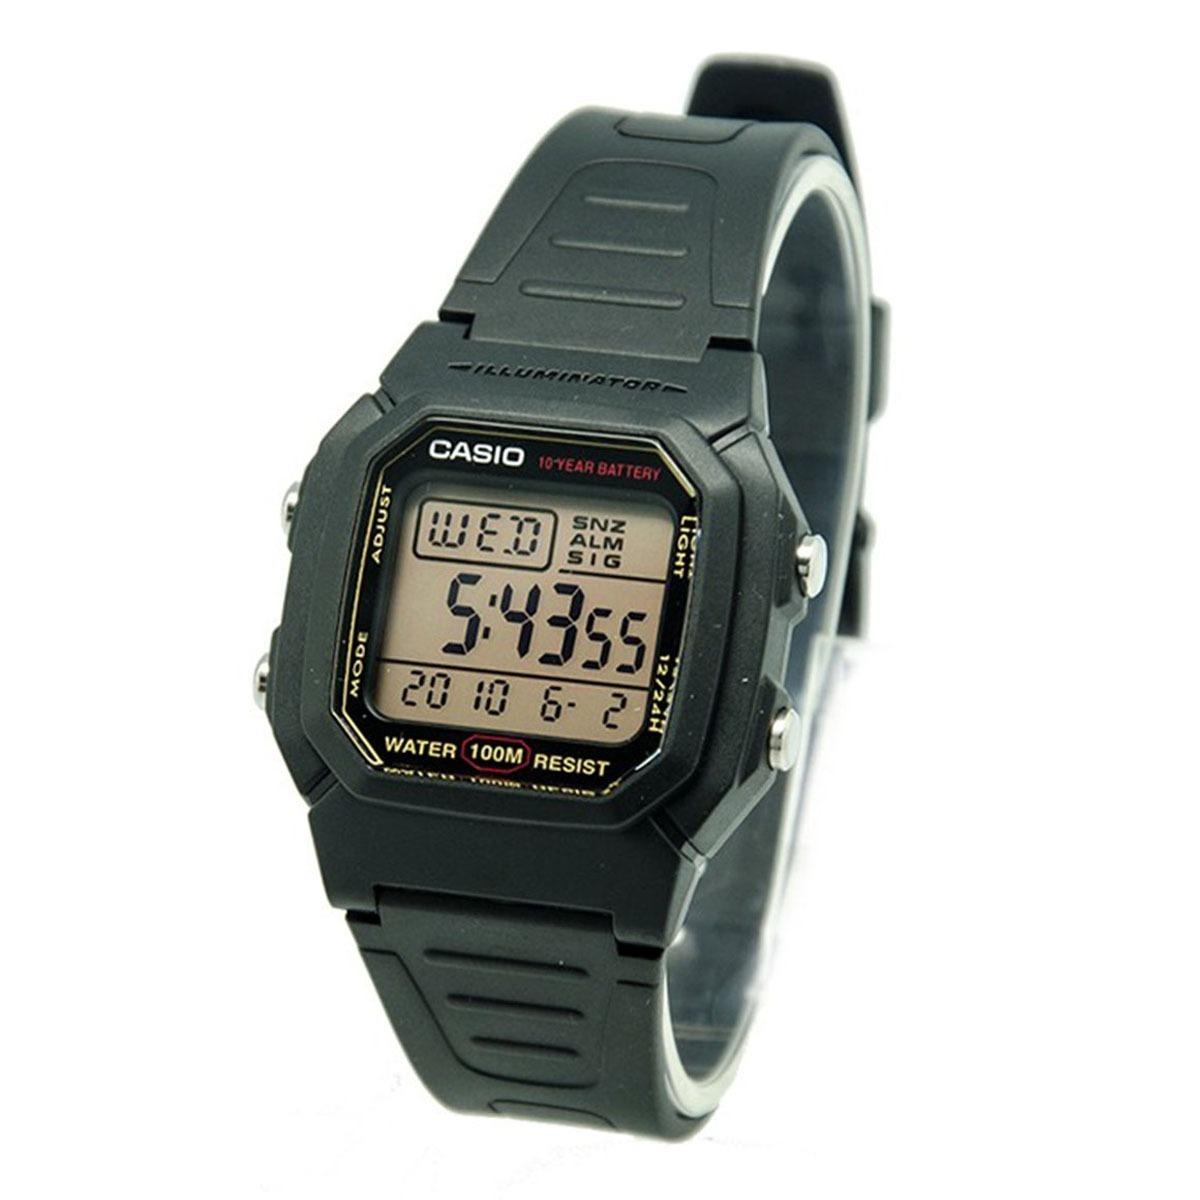 0387f0ad43d1 reloj casio hombre w-800hg-9a sumergible. Cargando zoom.